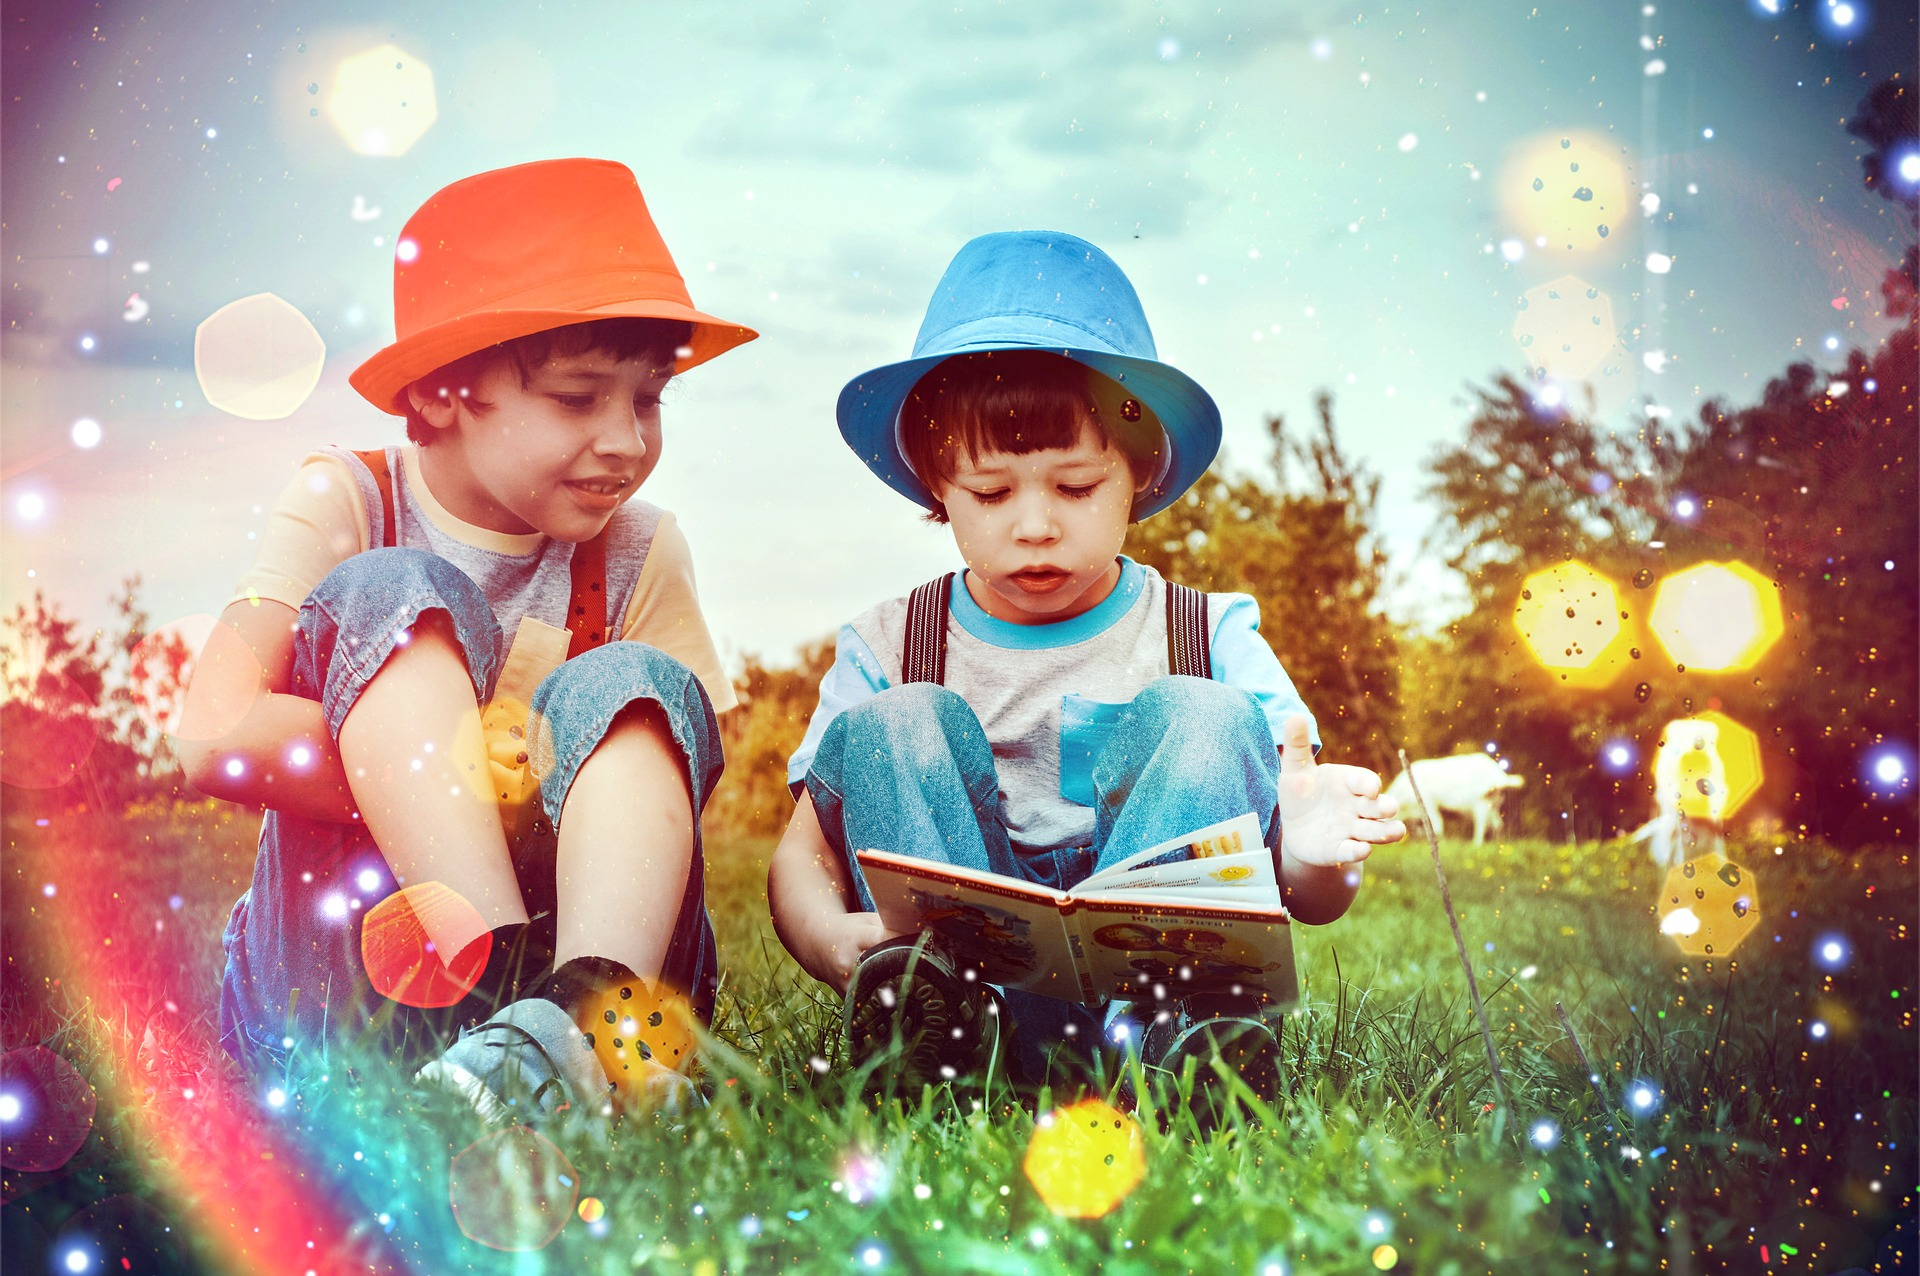 boys-4116363_1920_c_victoria-borodinova_pixabay